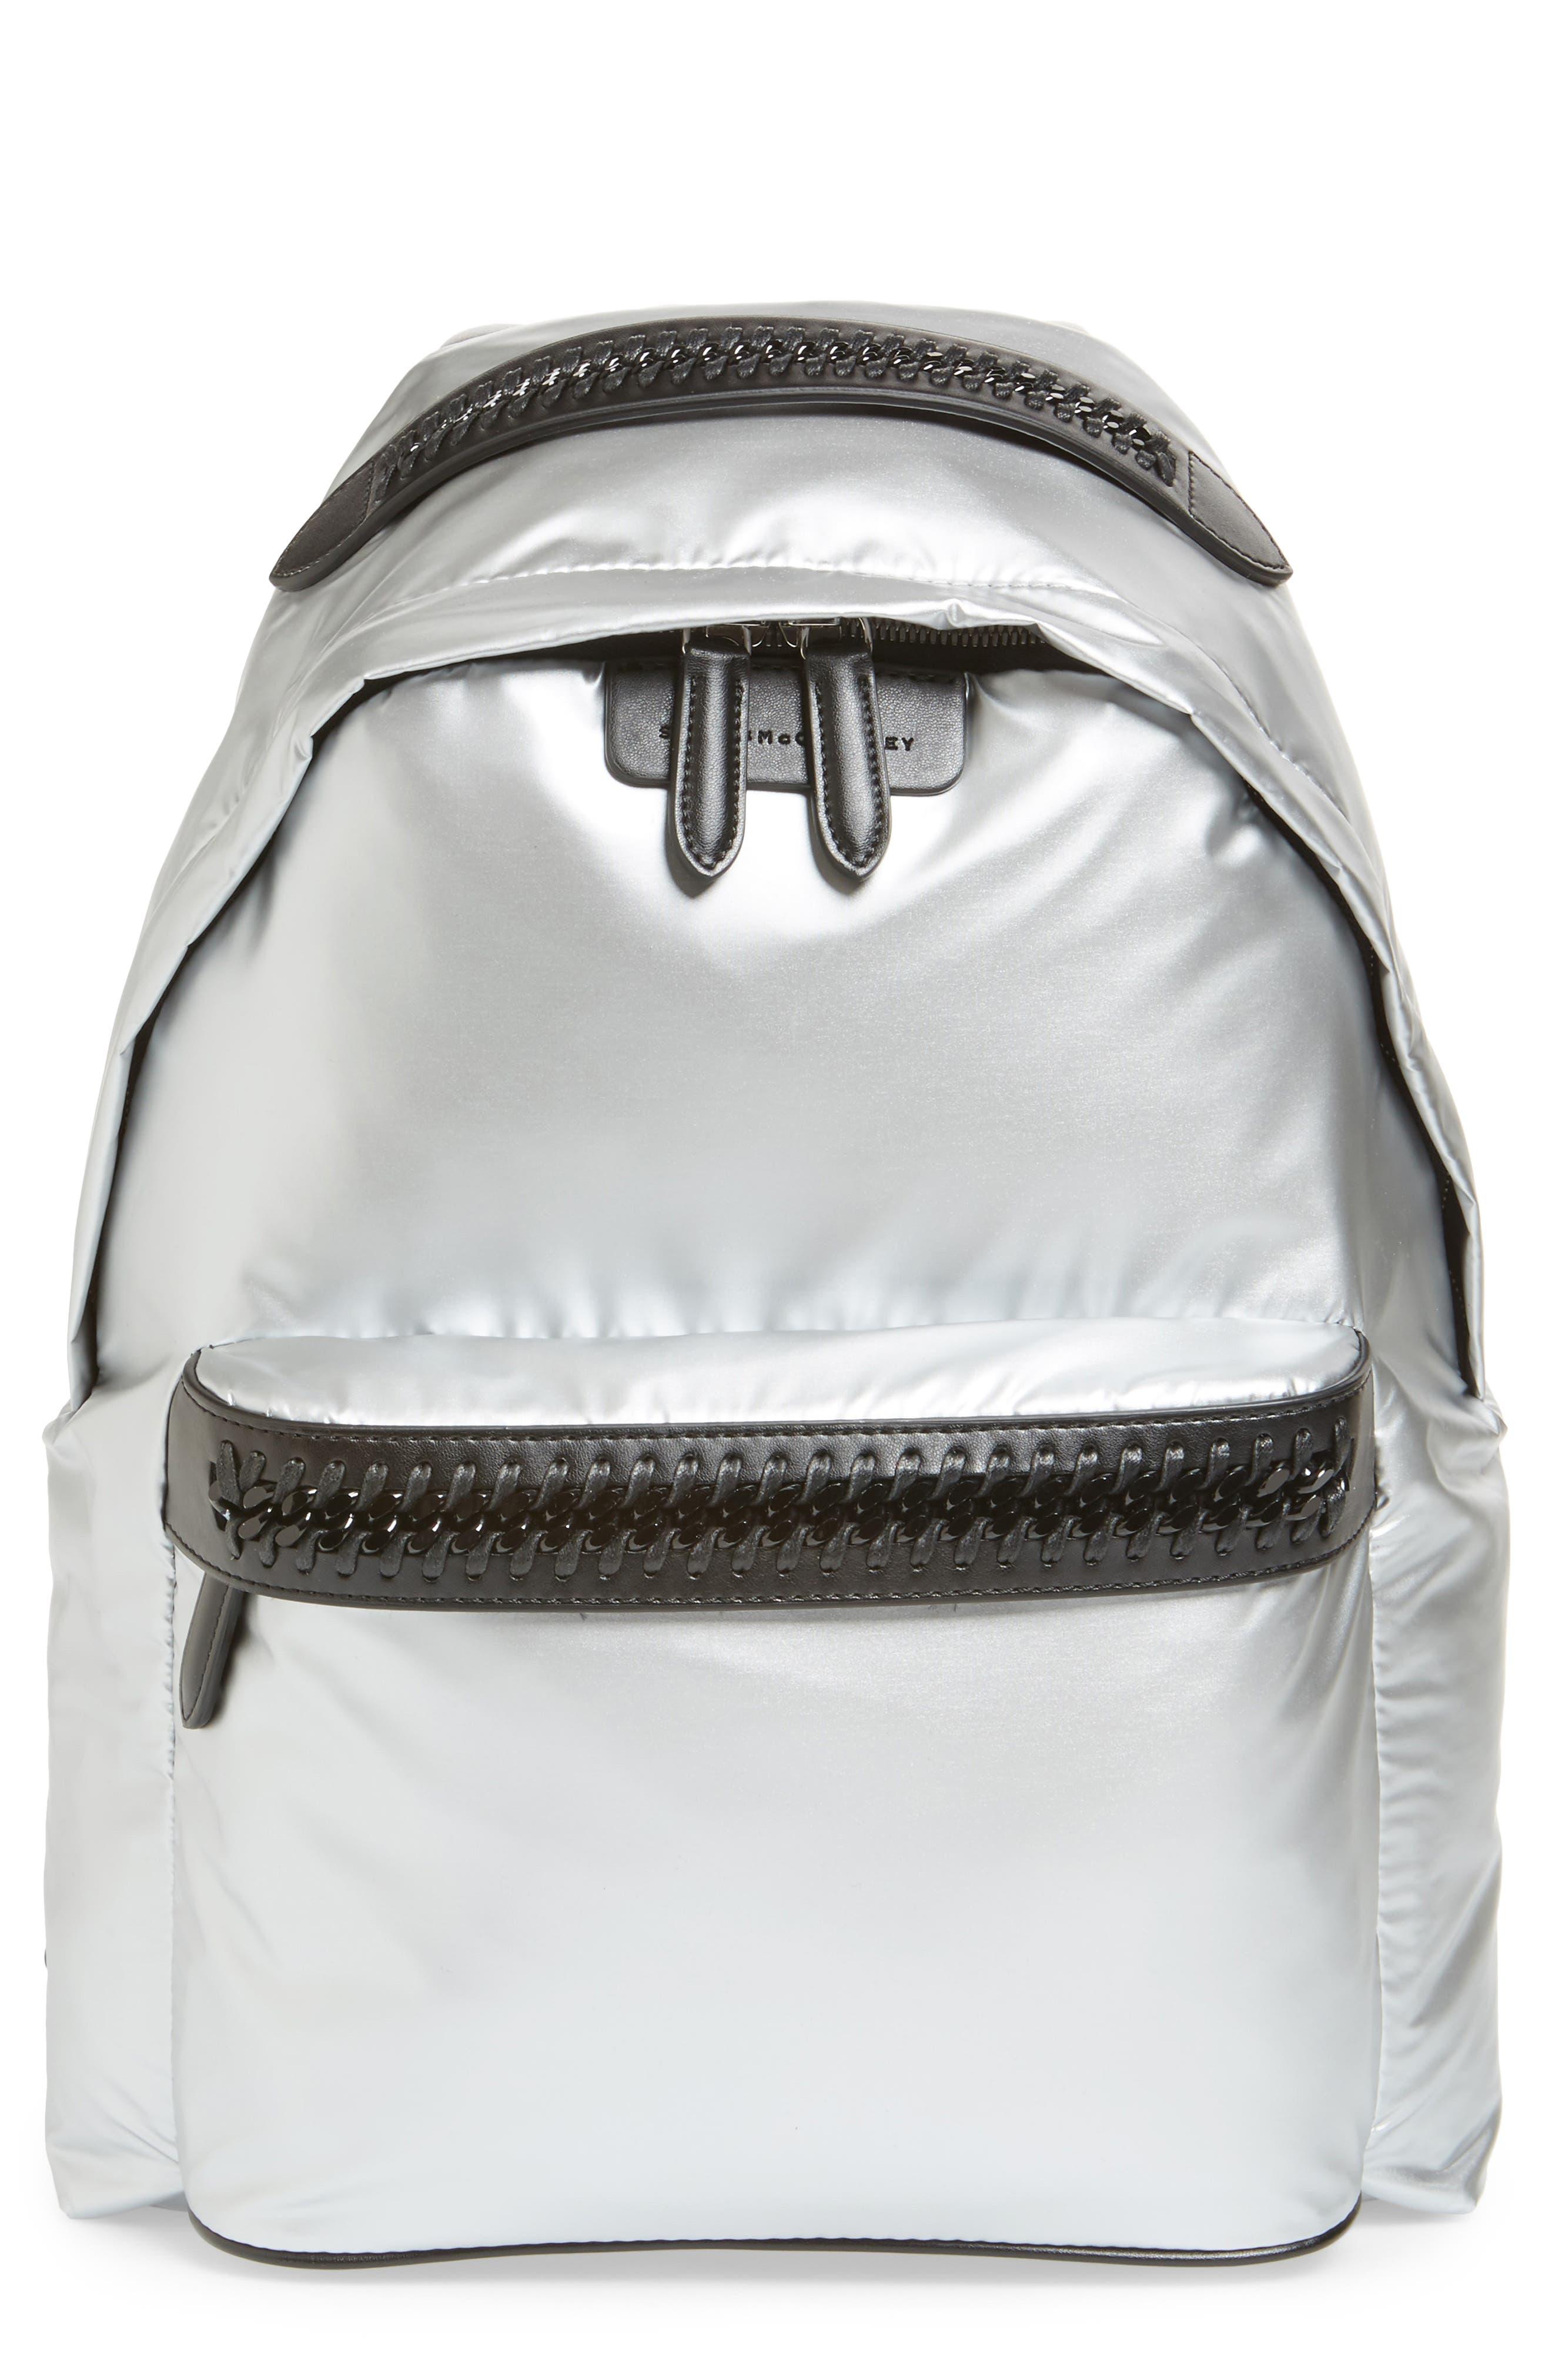 Falabella Metallic Nylon Backpack,                             Main thumbnail 1, color,                             045